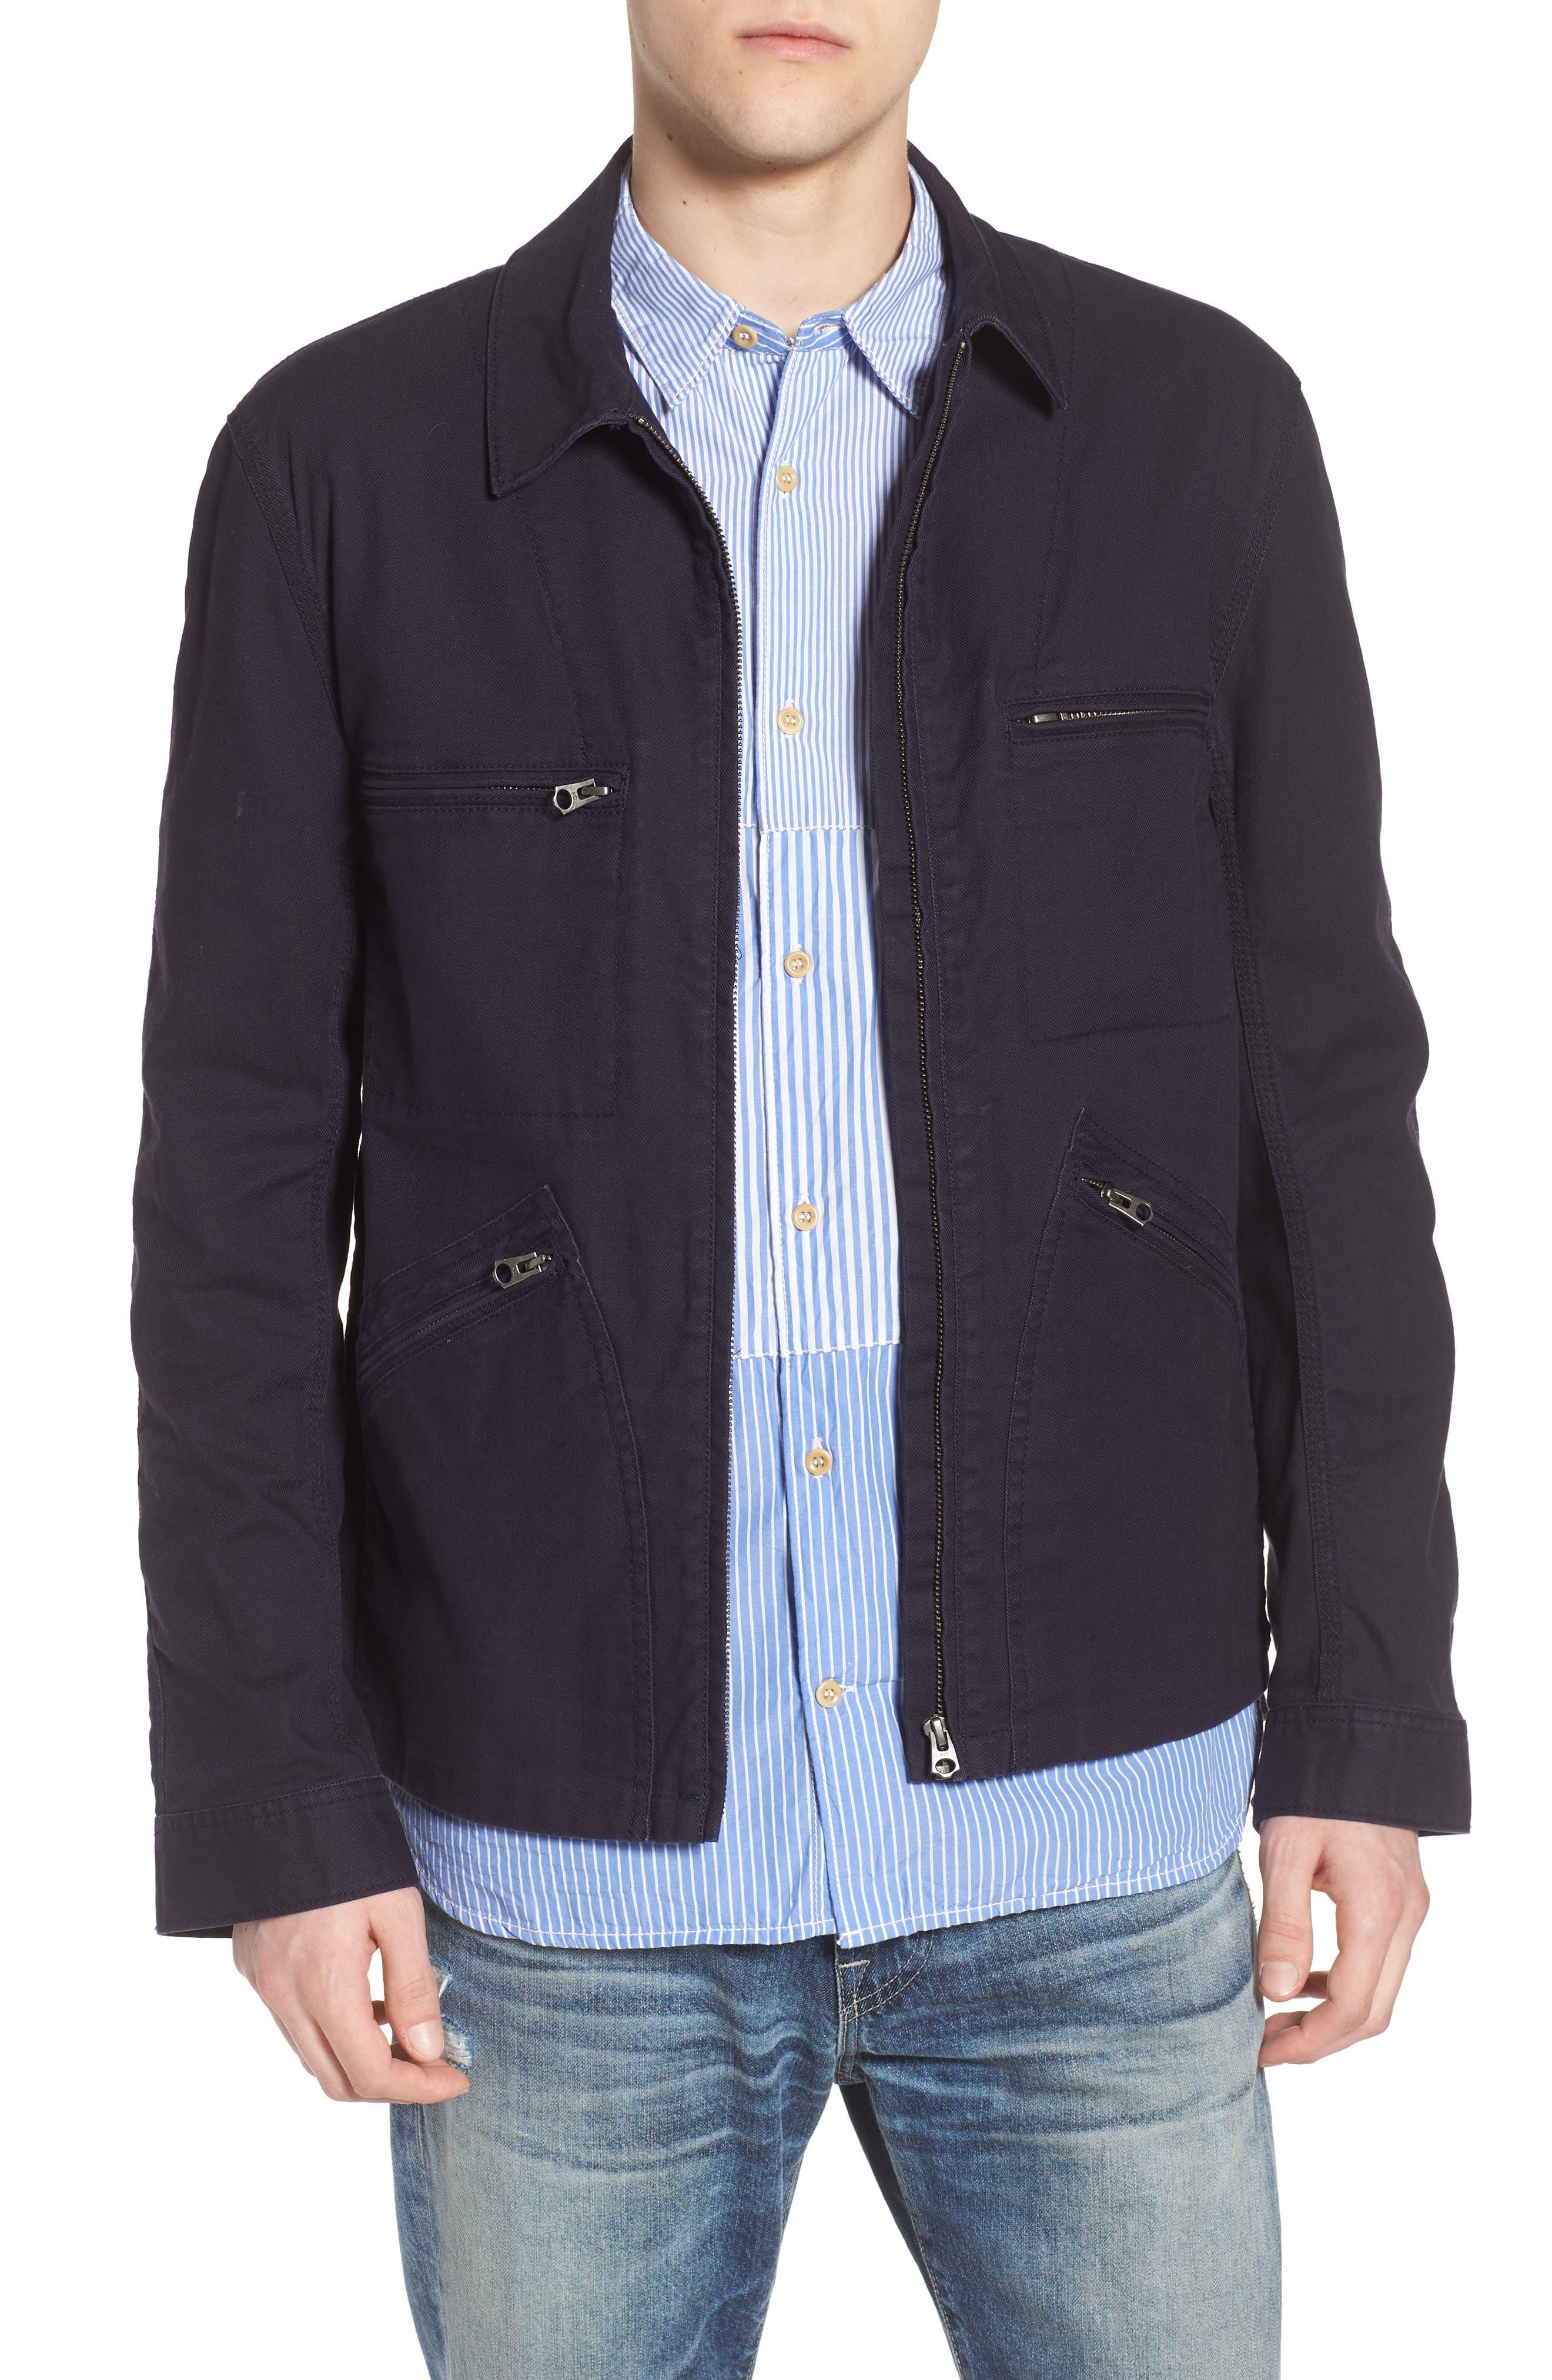 Slim Fit Slub Twill Cotton & Linen Jacket,                         Main,                         color, 001